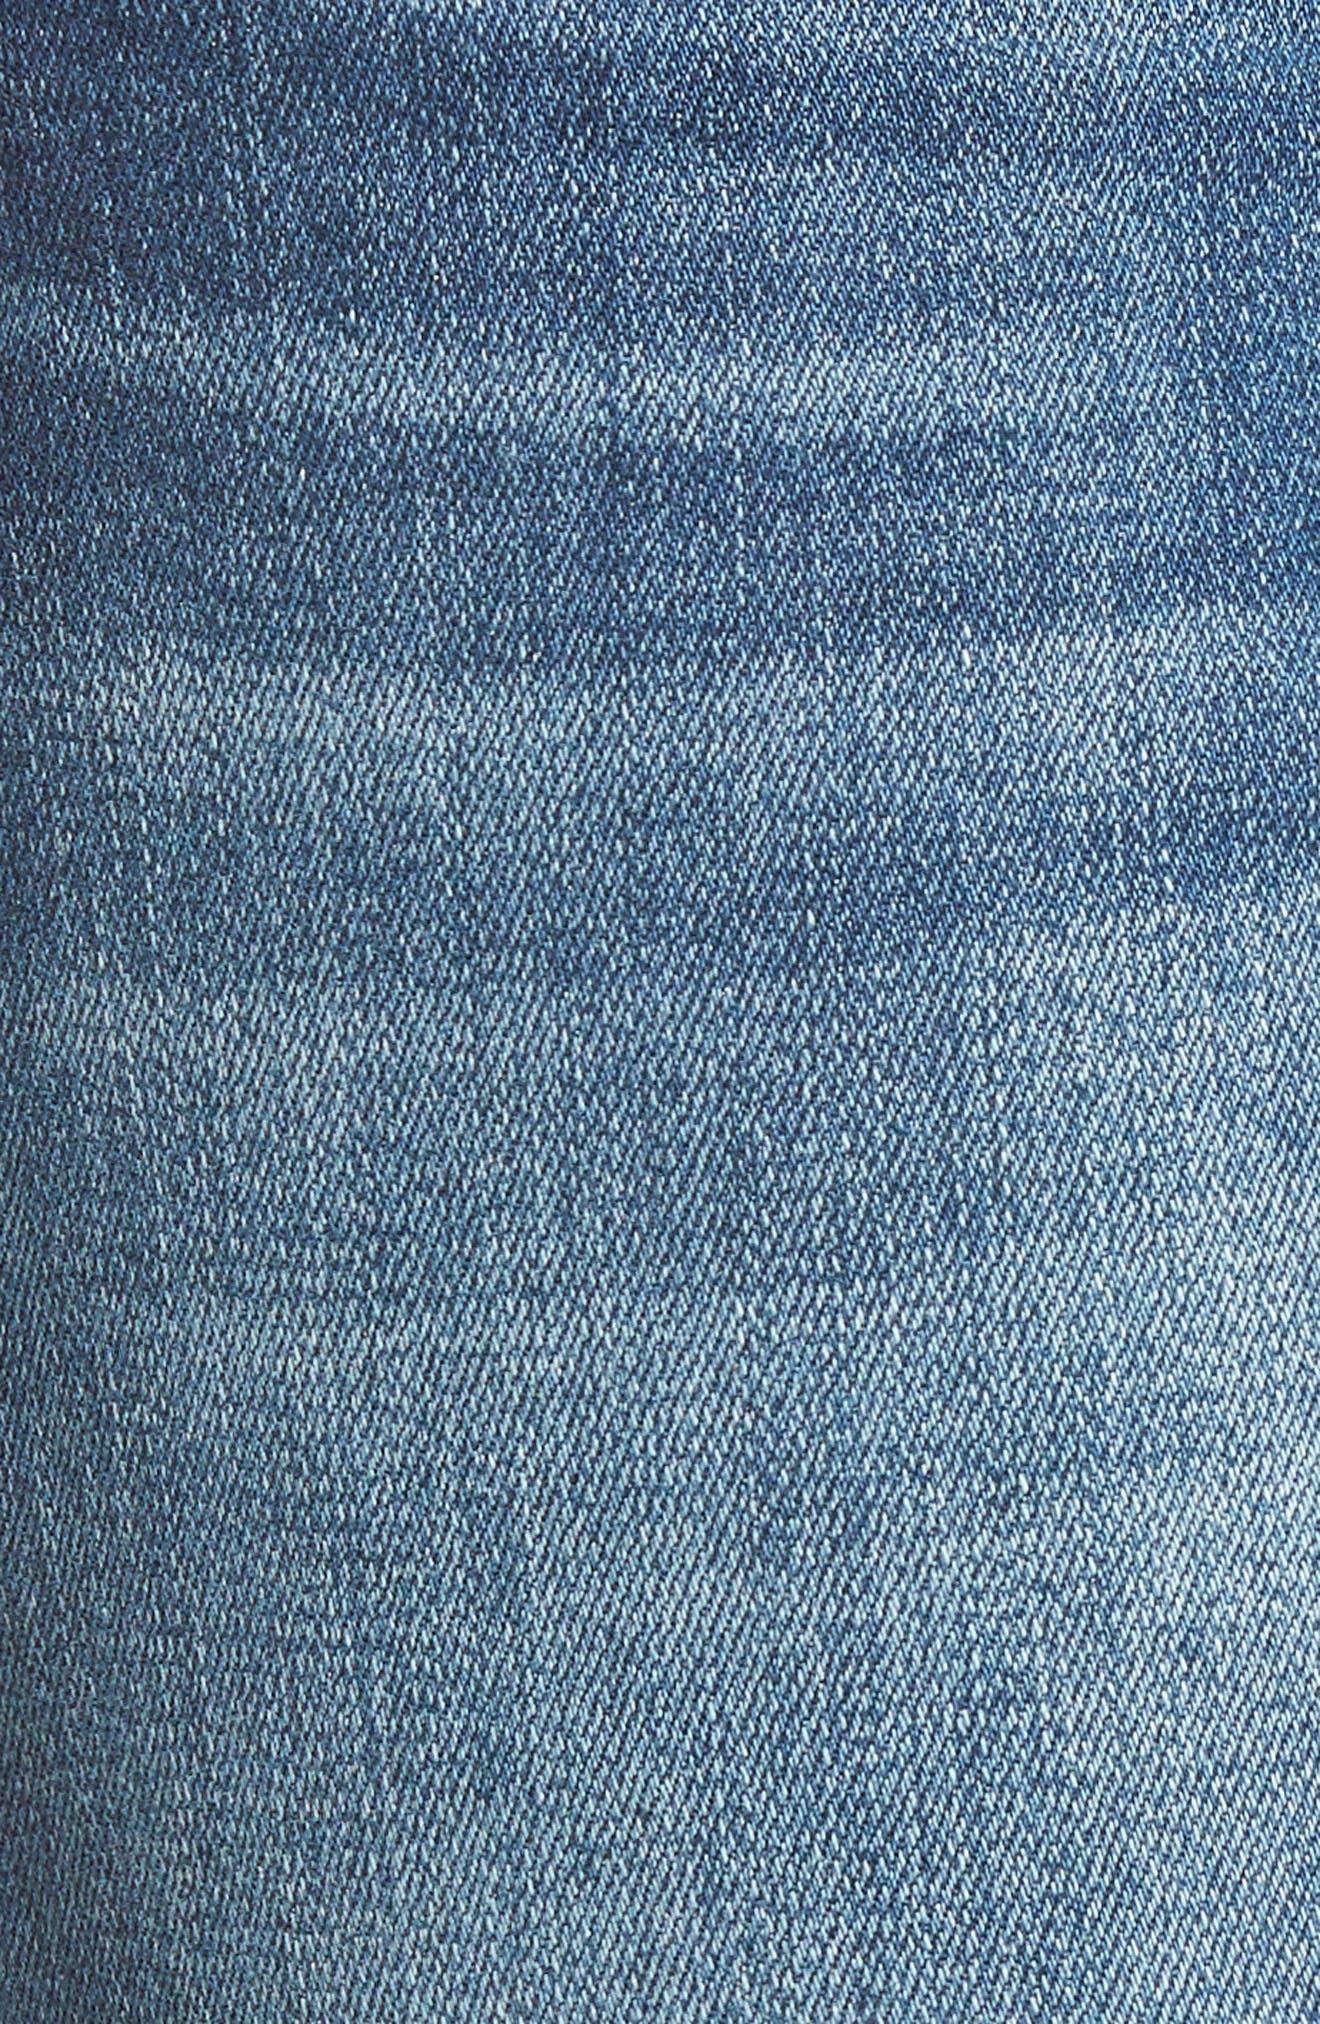 Ripped Step Hem Skinny Jeans,                             Alternate thumbnail 5, color,                             420